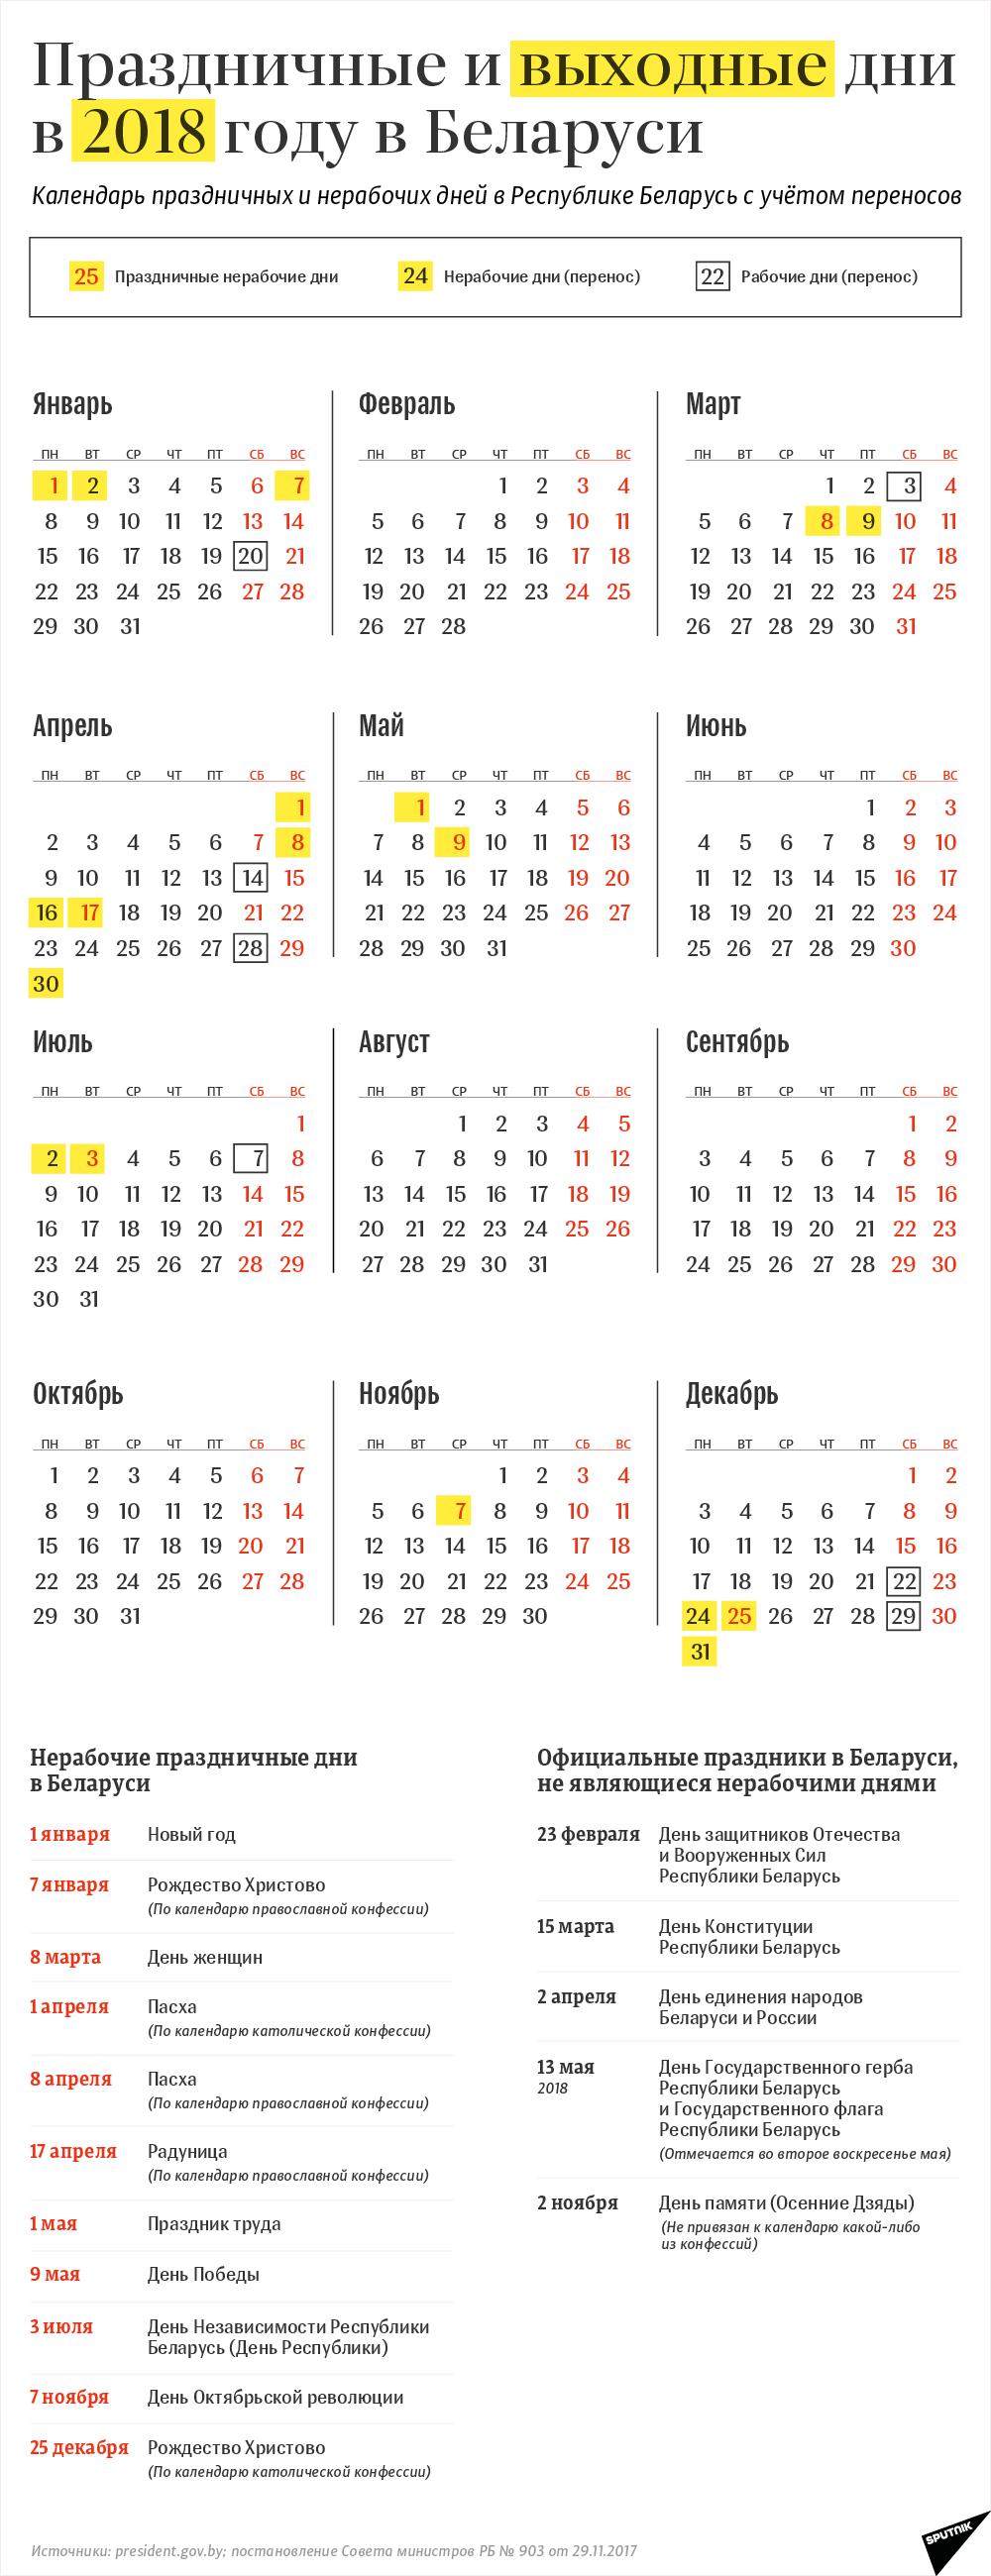 Праздники в беларуси по месяцам